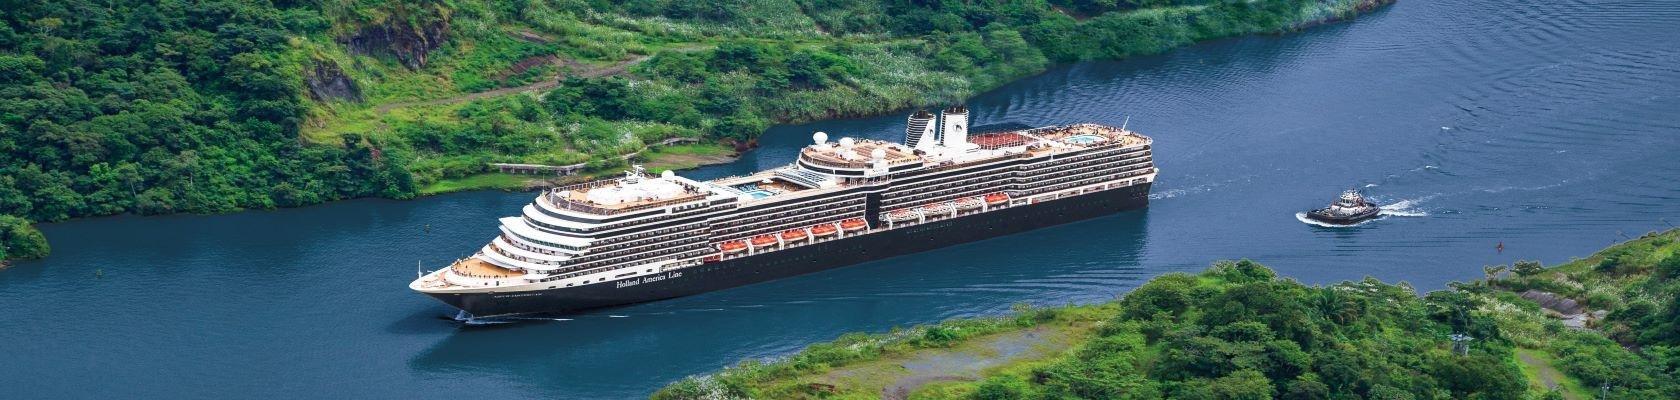 Cruiseschip op Panamakanaal